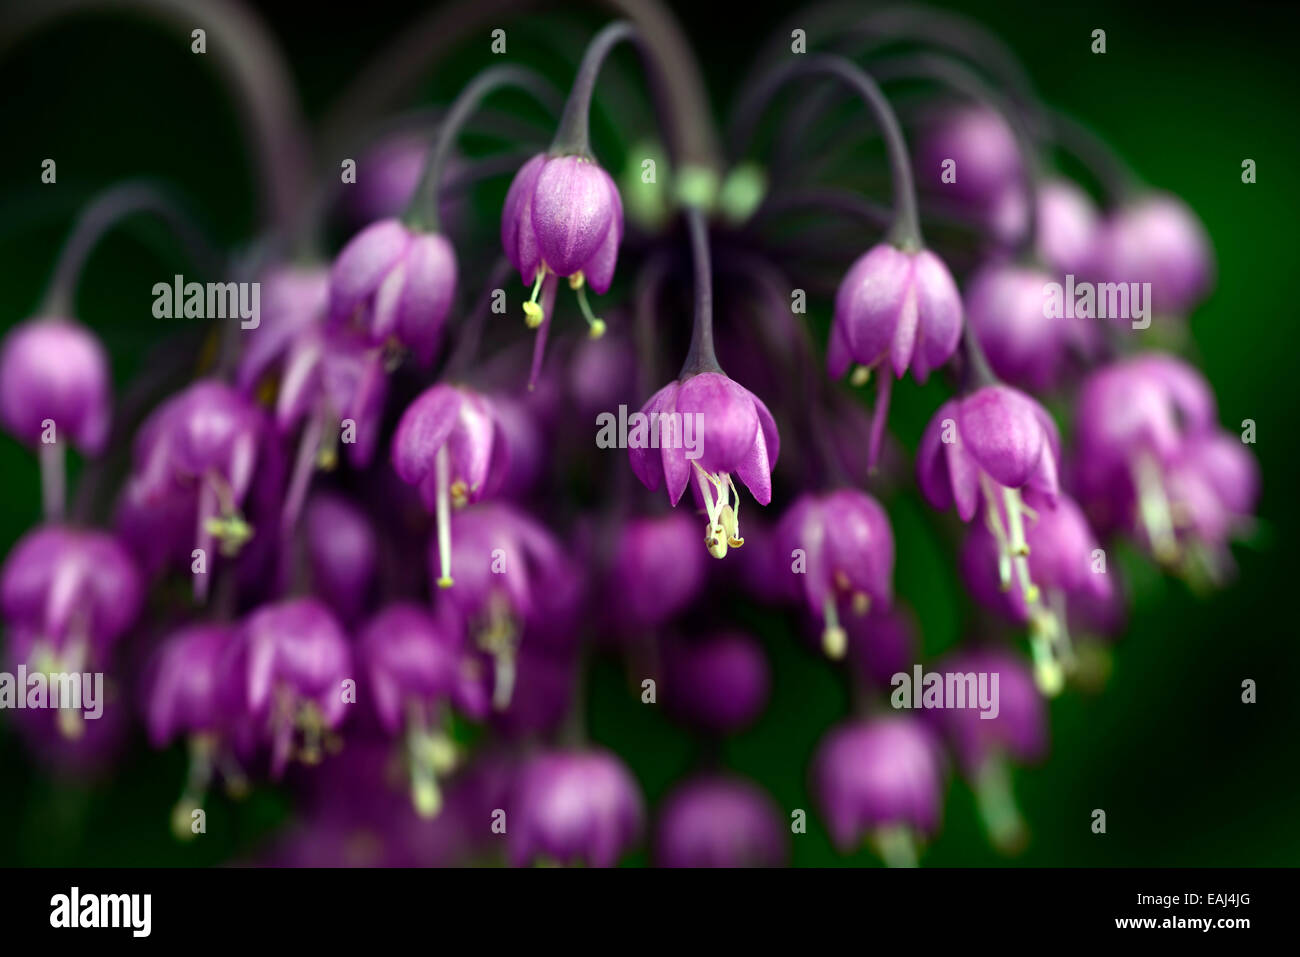 Allium Cernuum Purple Flower Flowers Flowering Nodding Onions Ladys